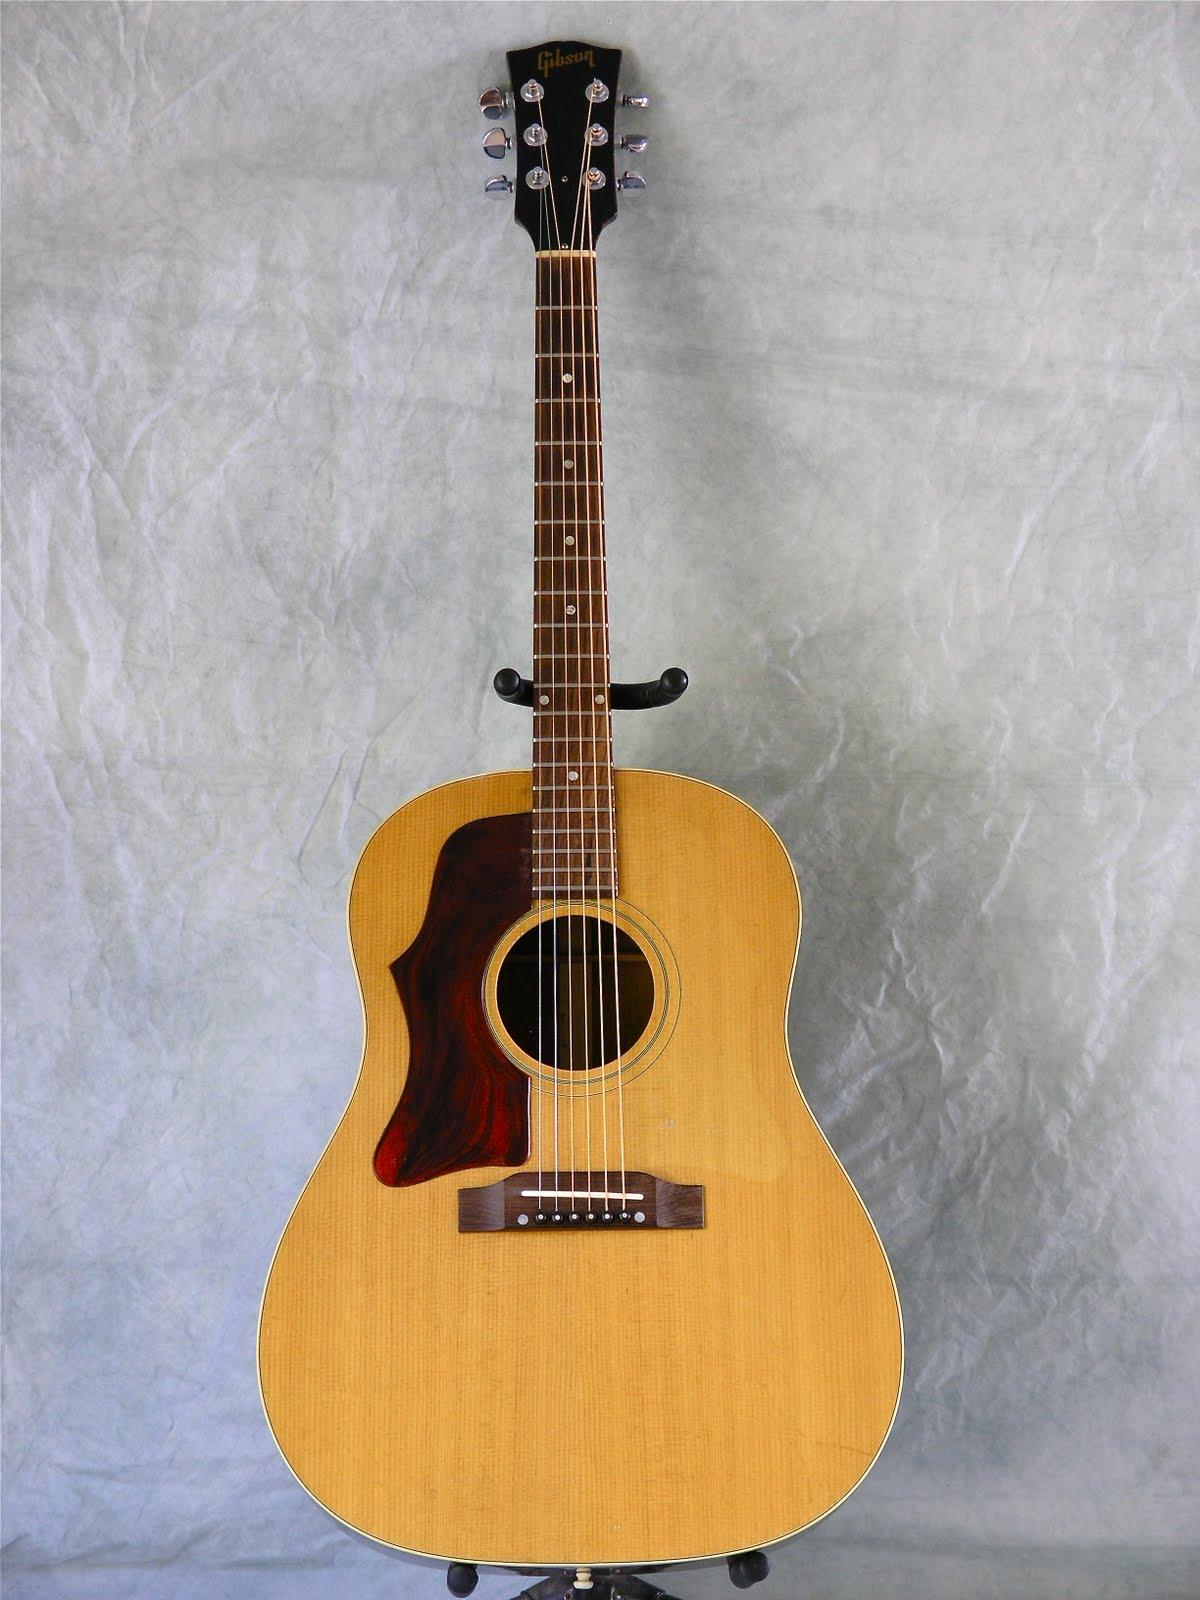 jerry 39 s lefty guitars newest guitar arrivals updated weekly 1967 gibson j50 left handed 5 25 11. Black Bedroom Furniture Sets. Home Design Ideas